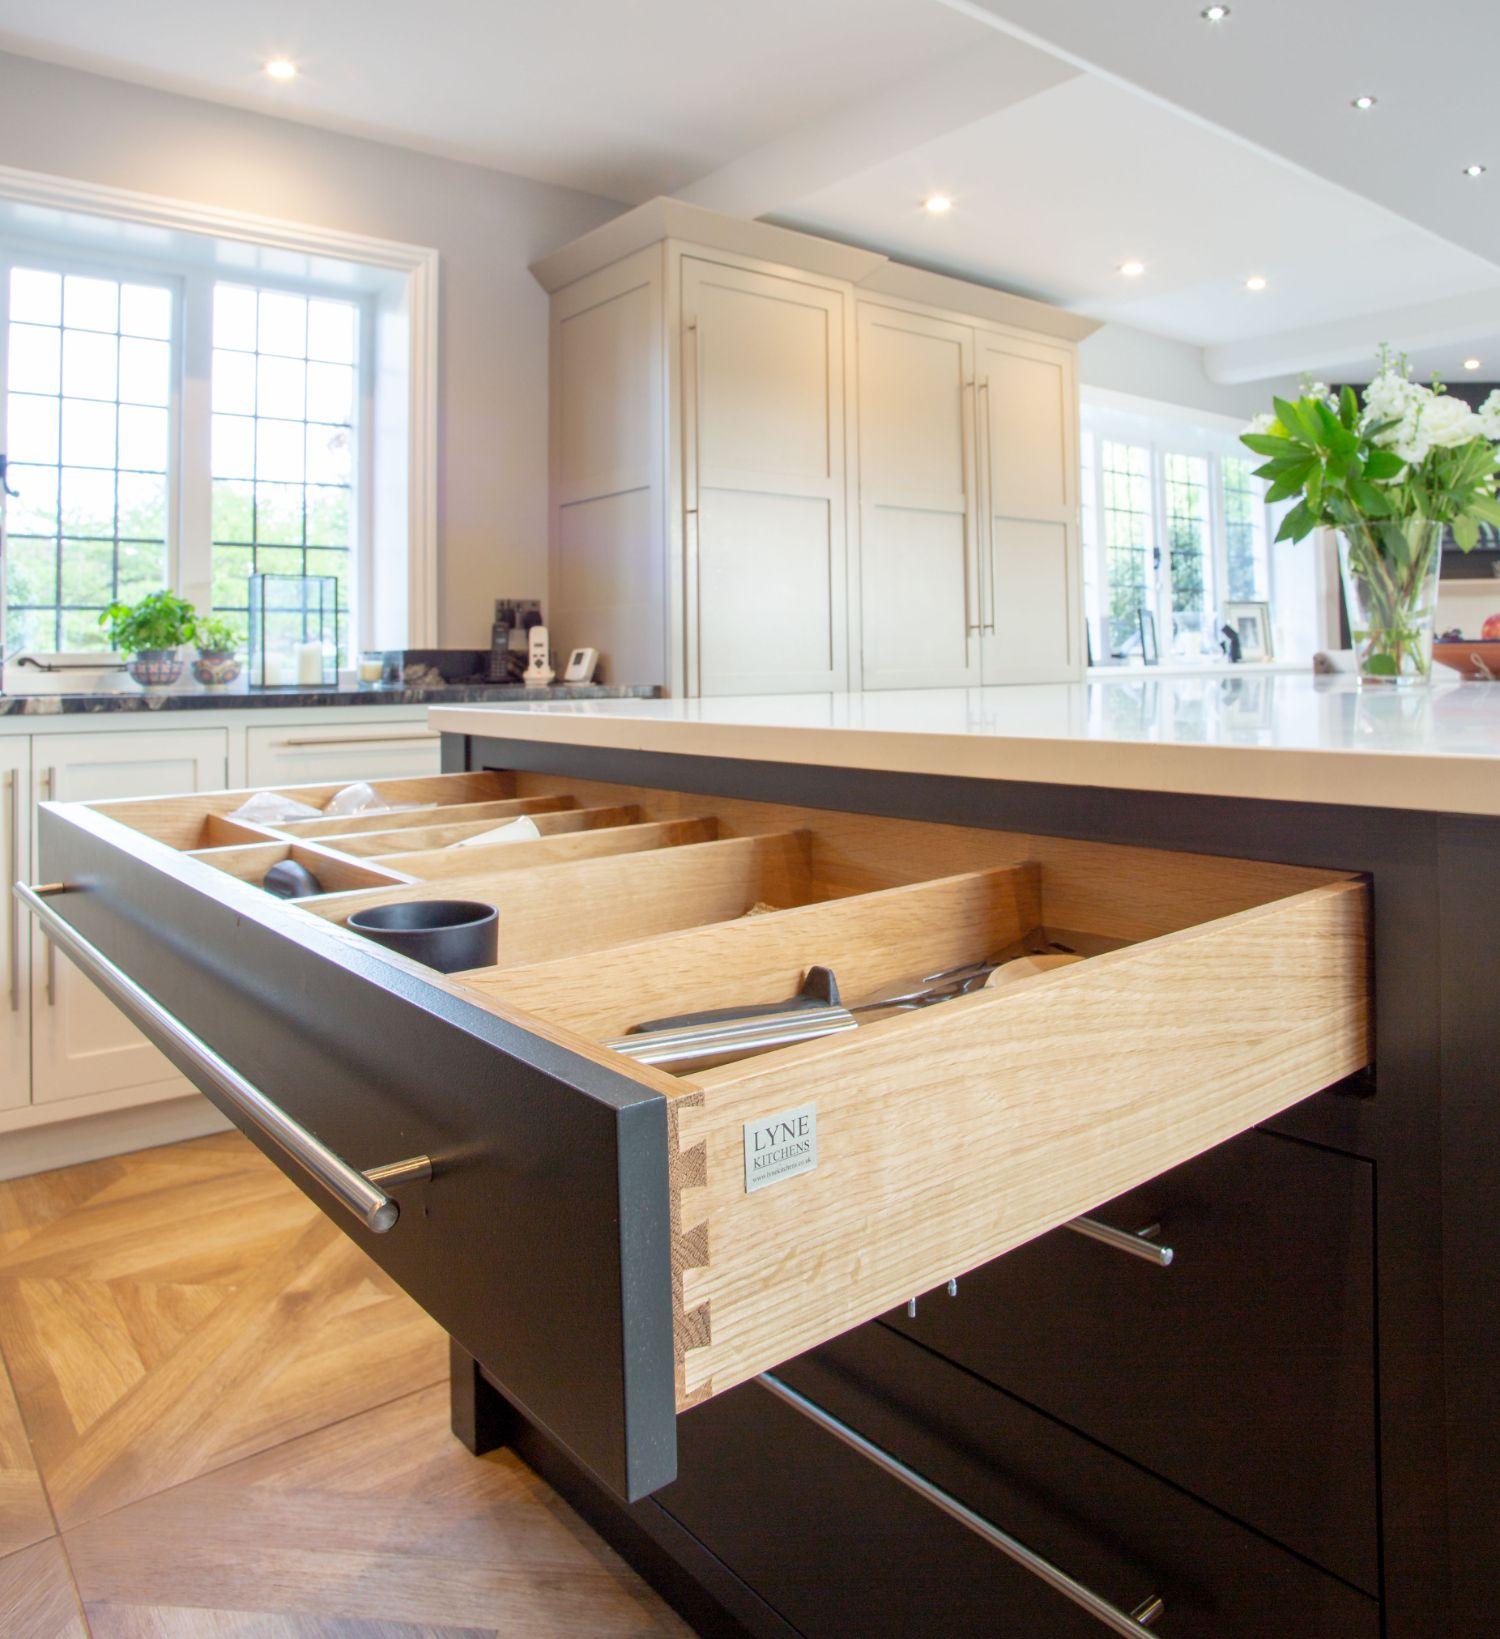 Lyne Kitchens | Chiddingfold Surrey 9